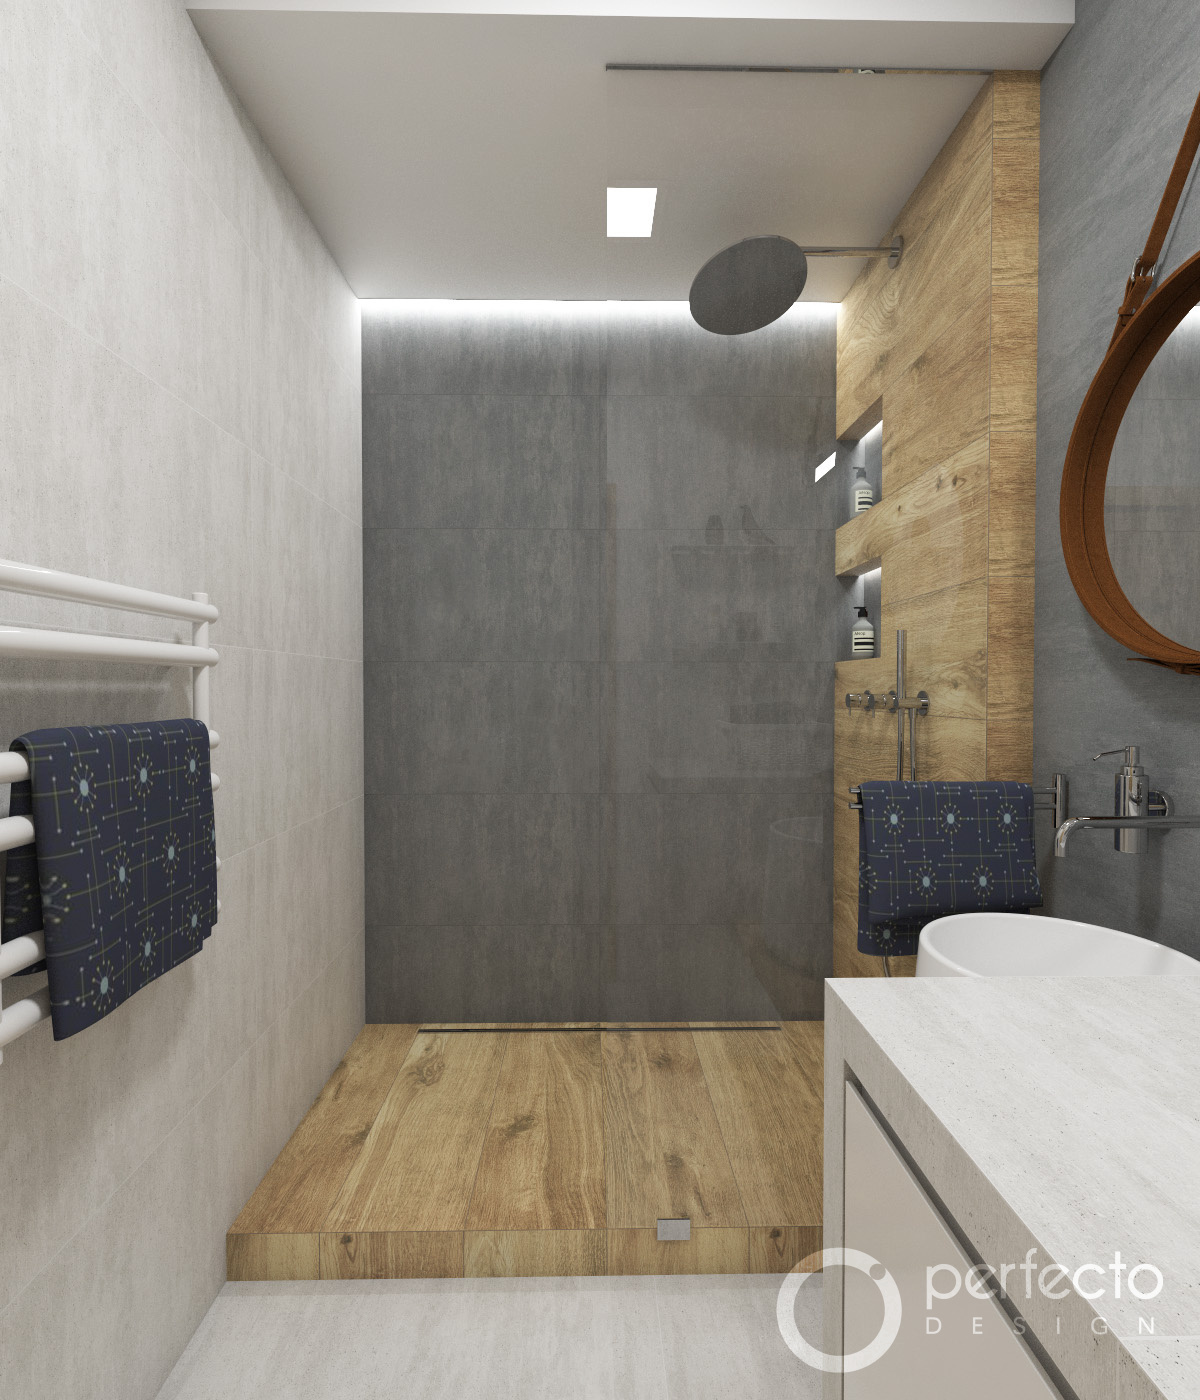 natur-badezimmer scandinavia | perfecto design, Badezimmer